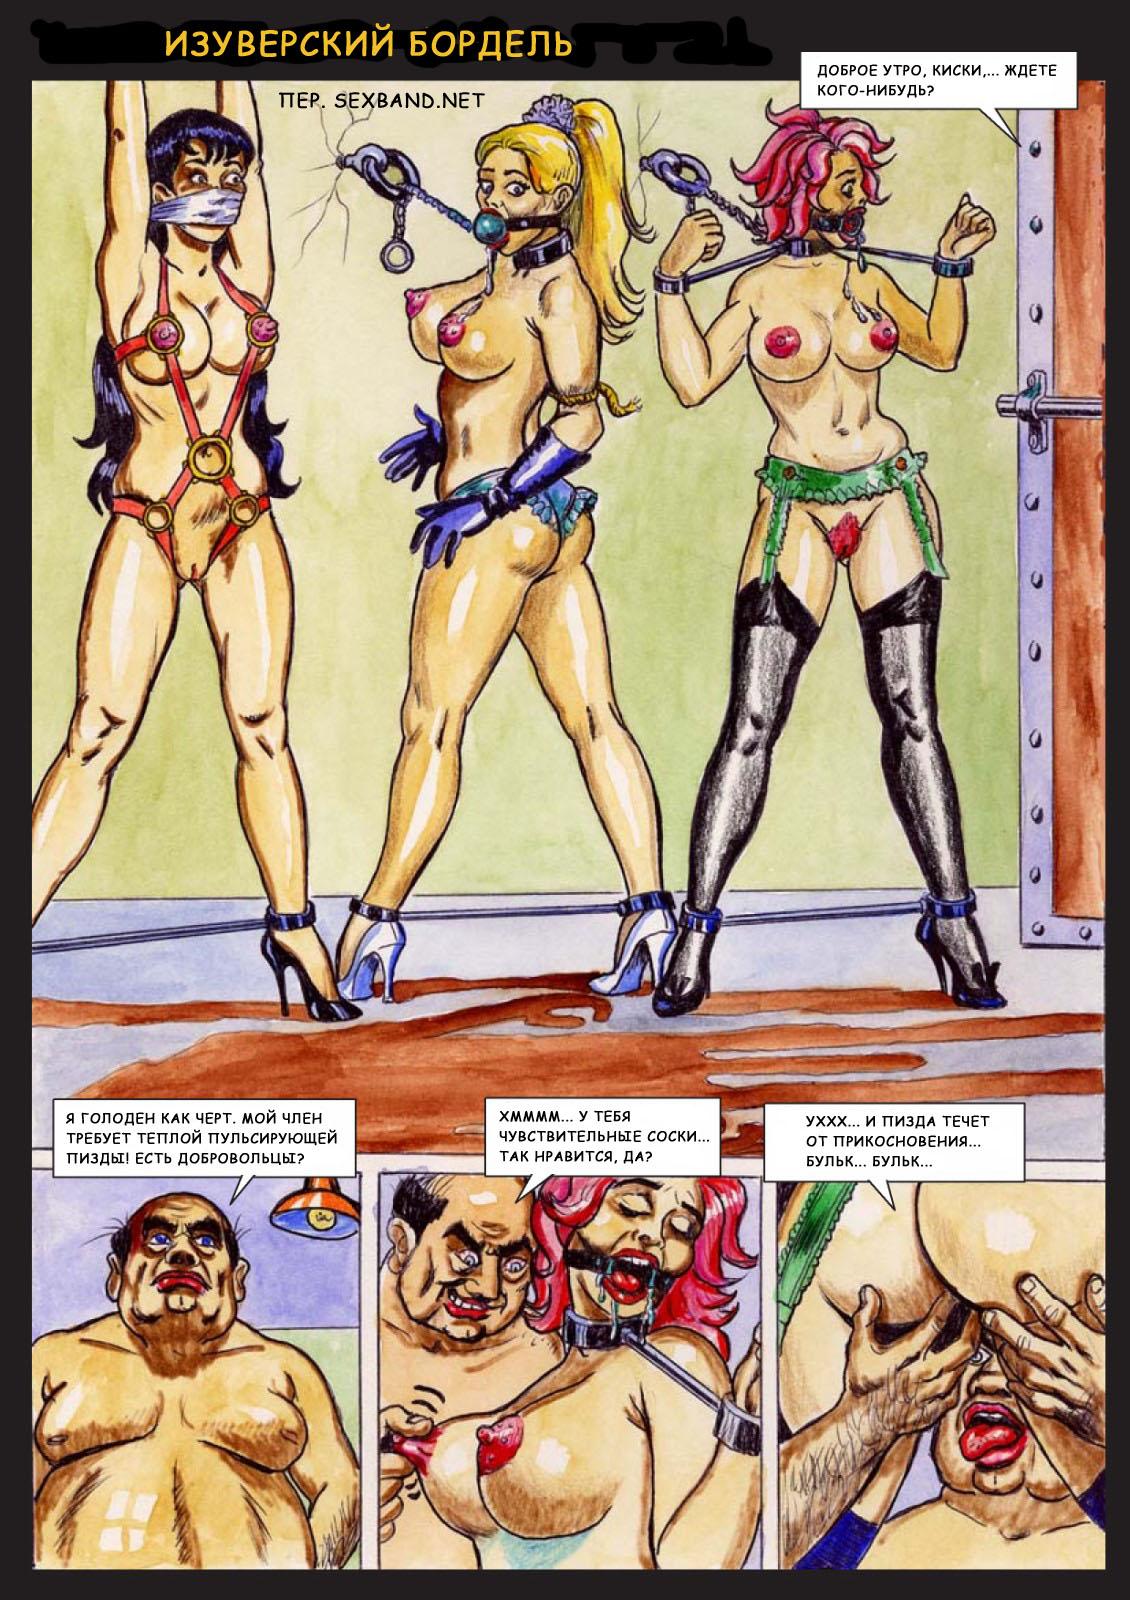 porno-rasskaz-bordel